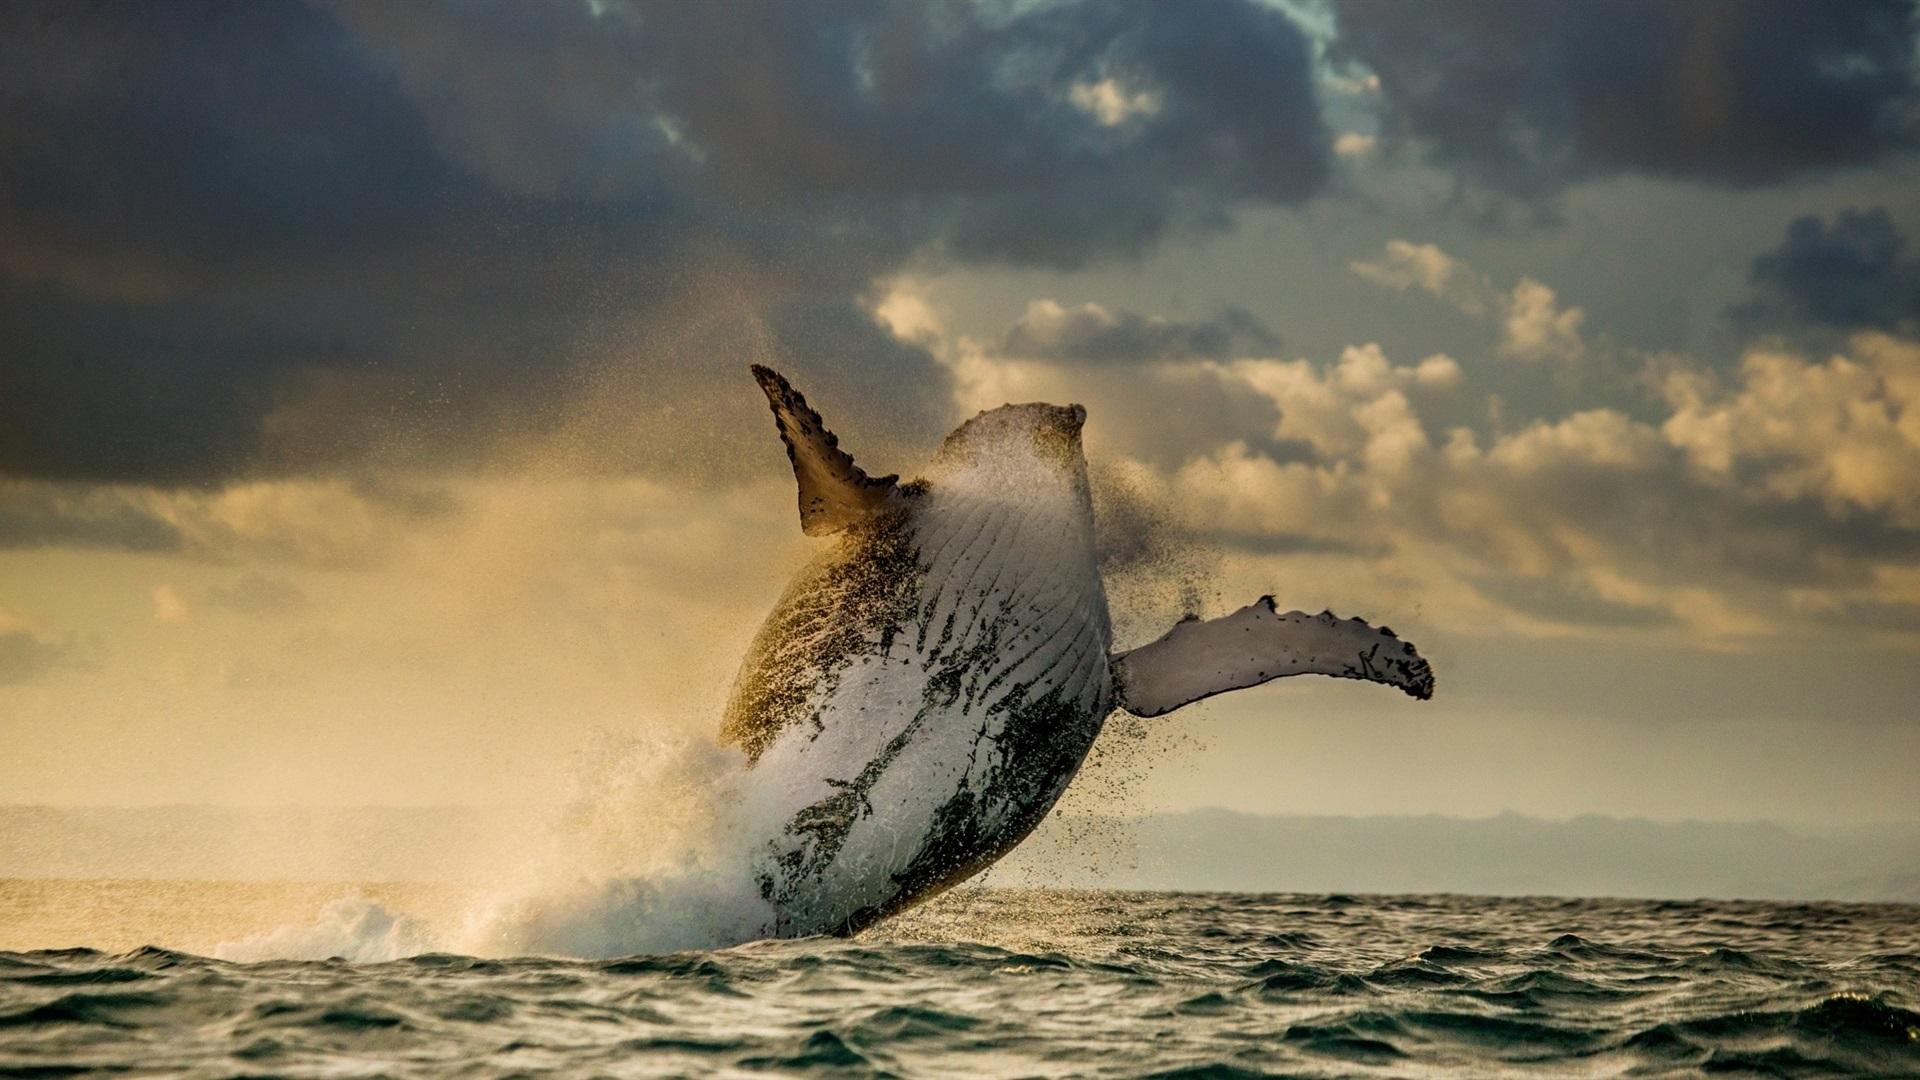 16 Luxury Pubg Wallpaper Iphone 6: 壁纸 海洋,鲸鱼,跳跃 1920x1080 Full HD 2K 高清壁纸, 图片, 照片